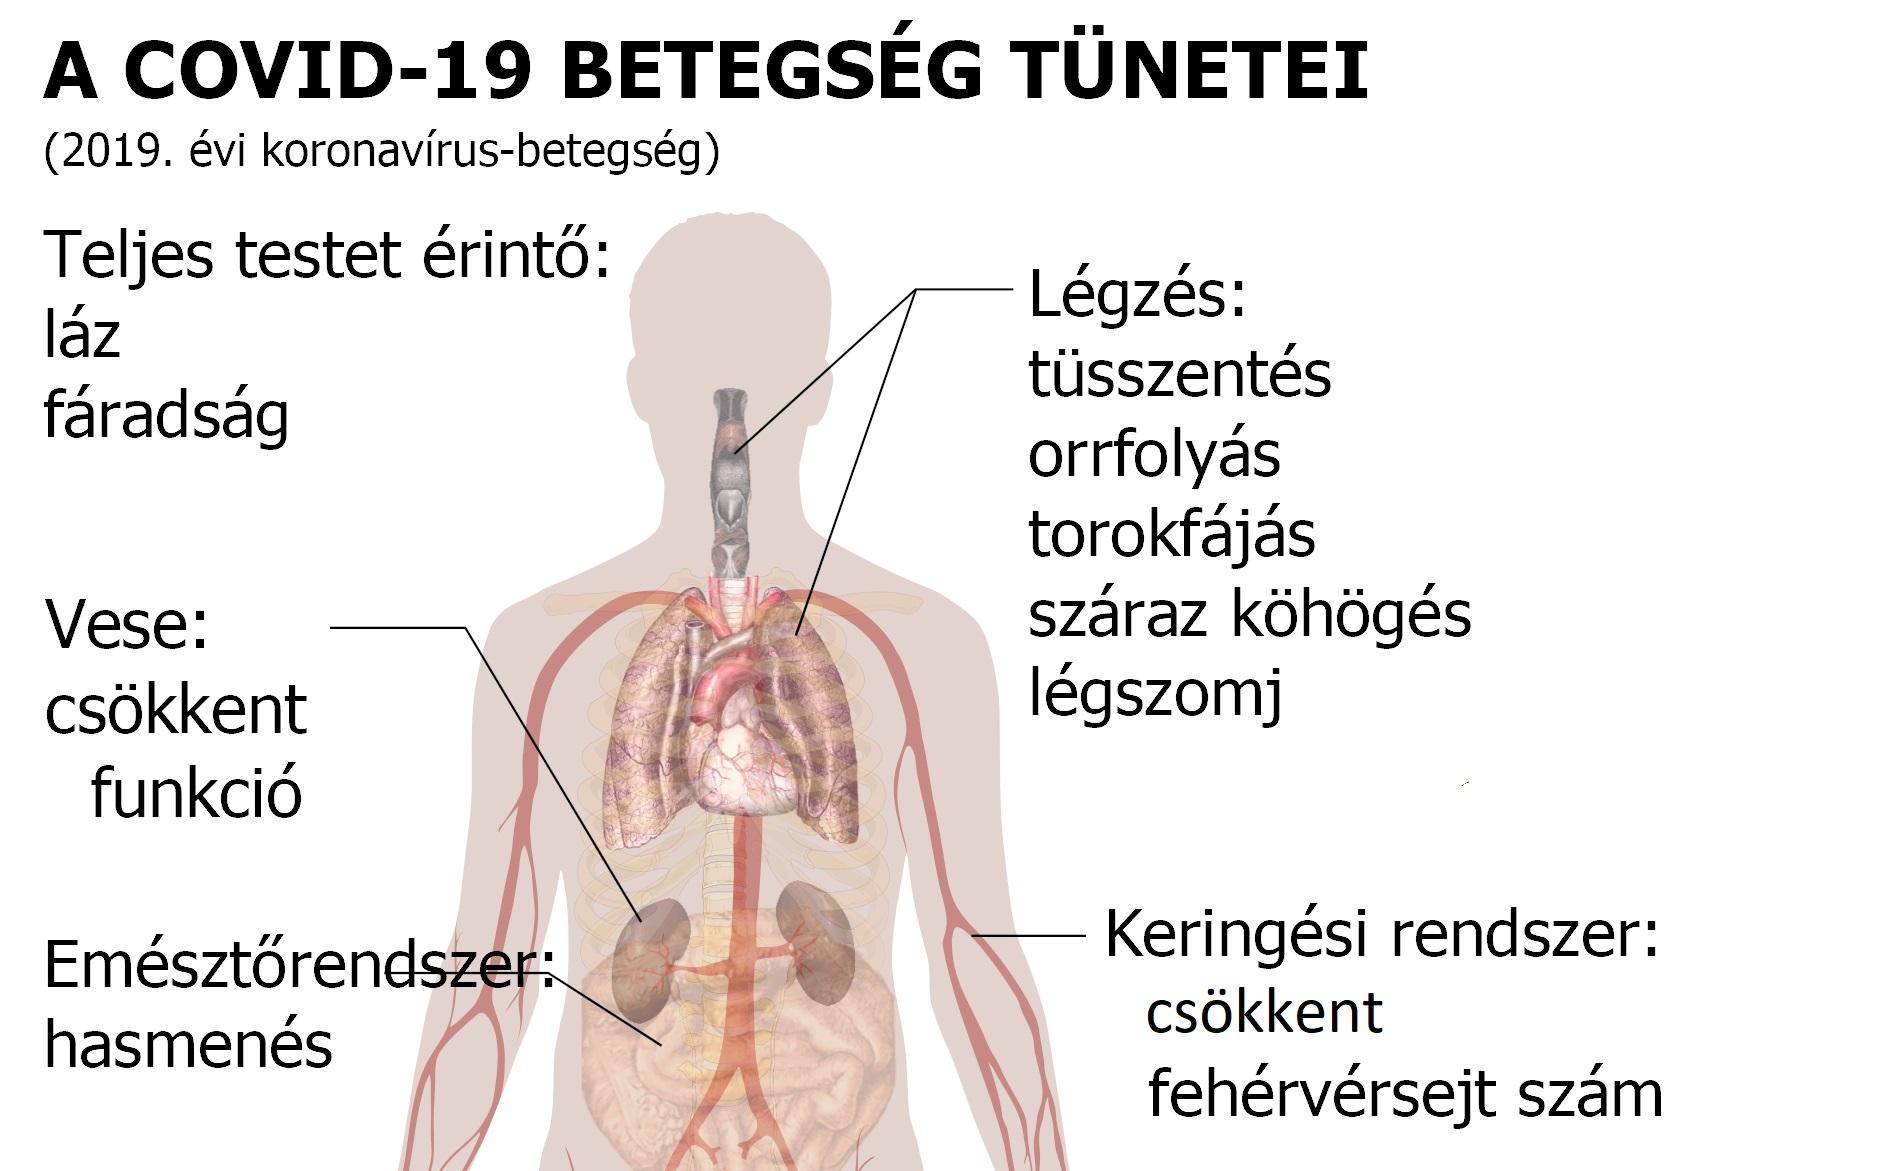 A helminthiasis tüneteit jelzi - andrea-design.hu